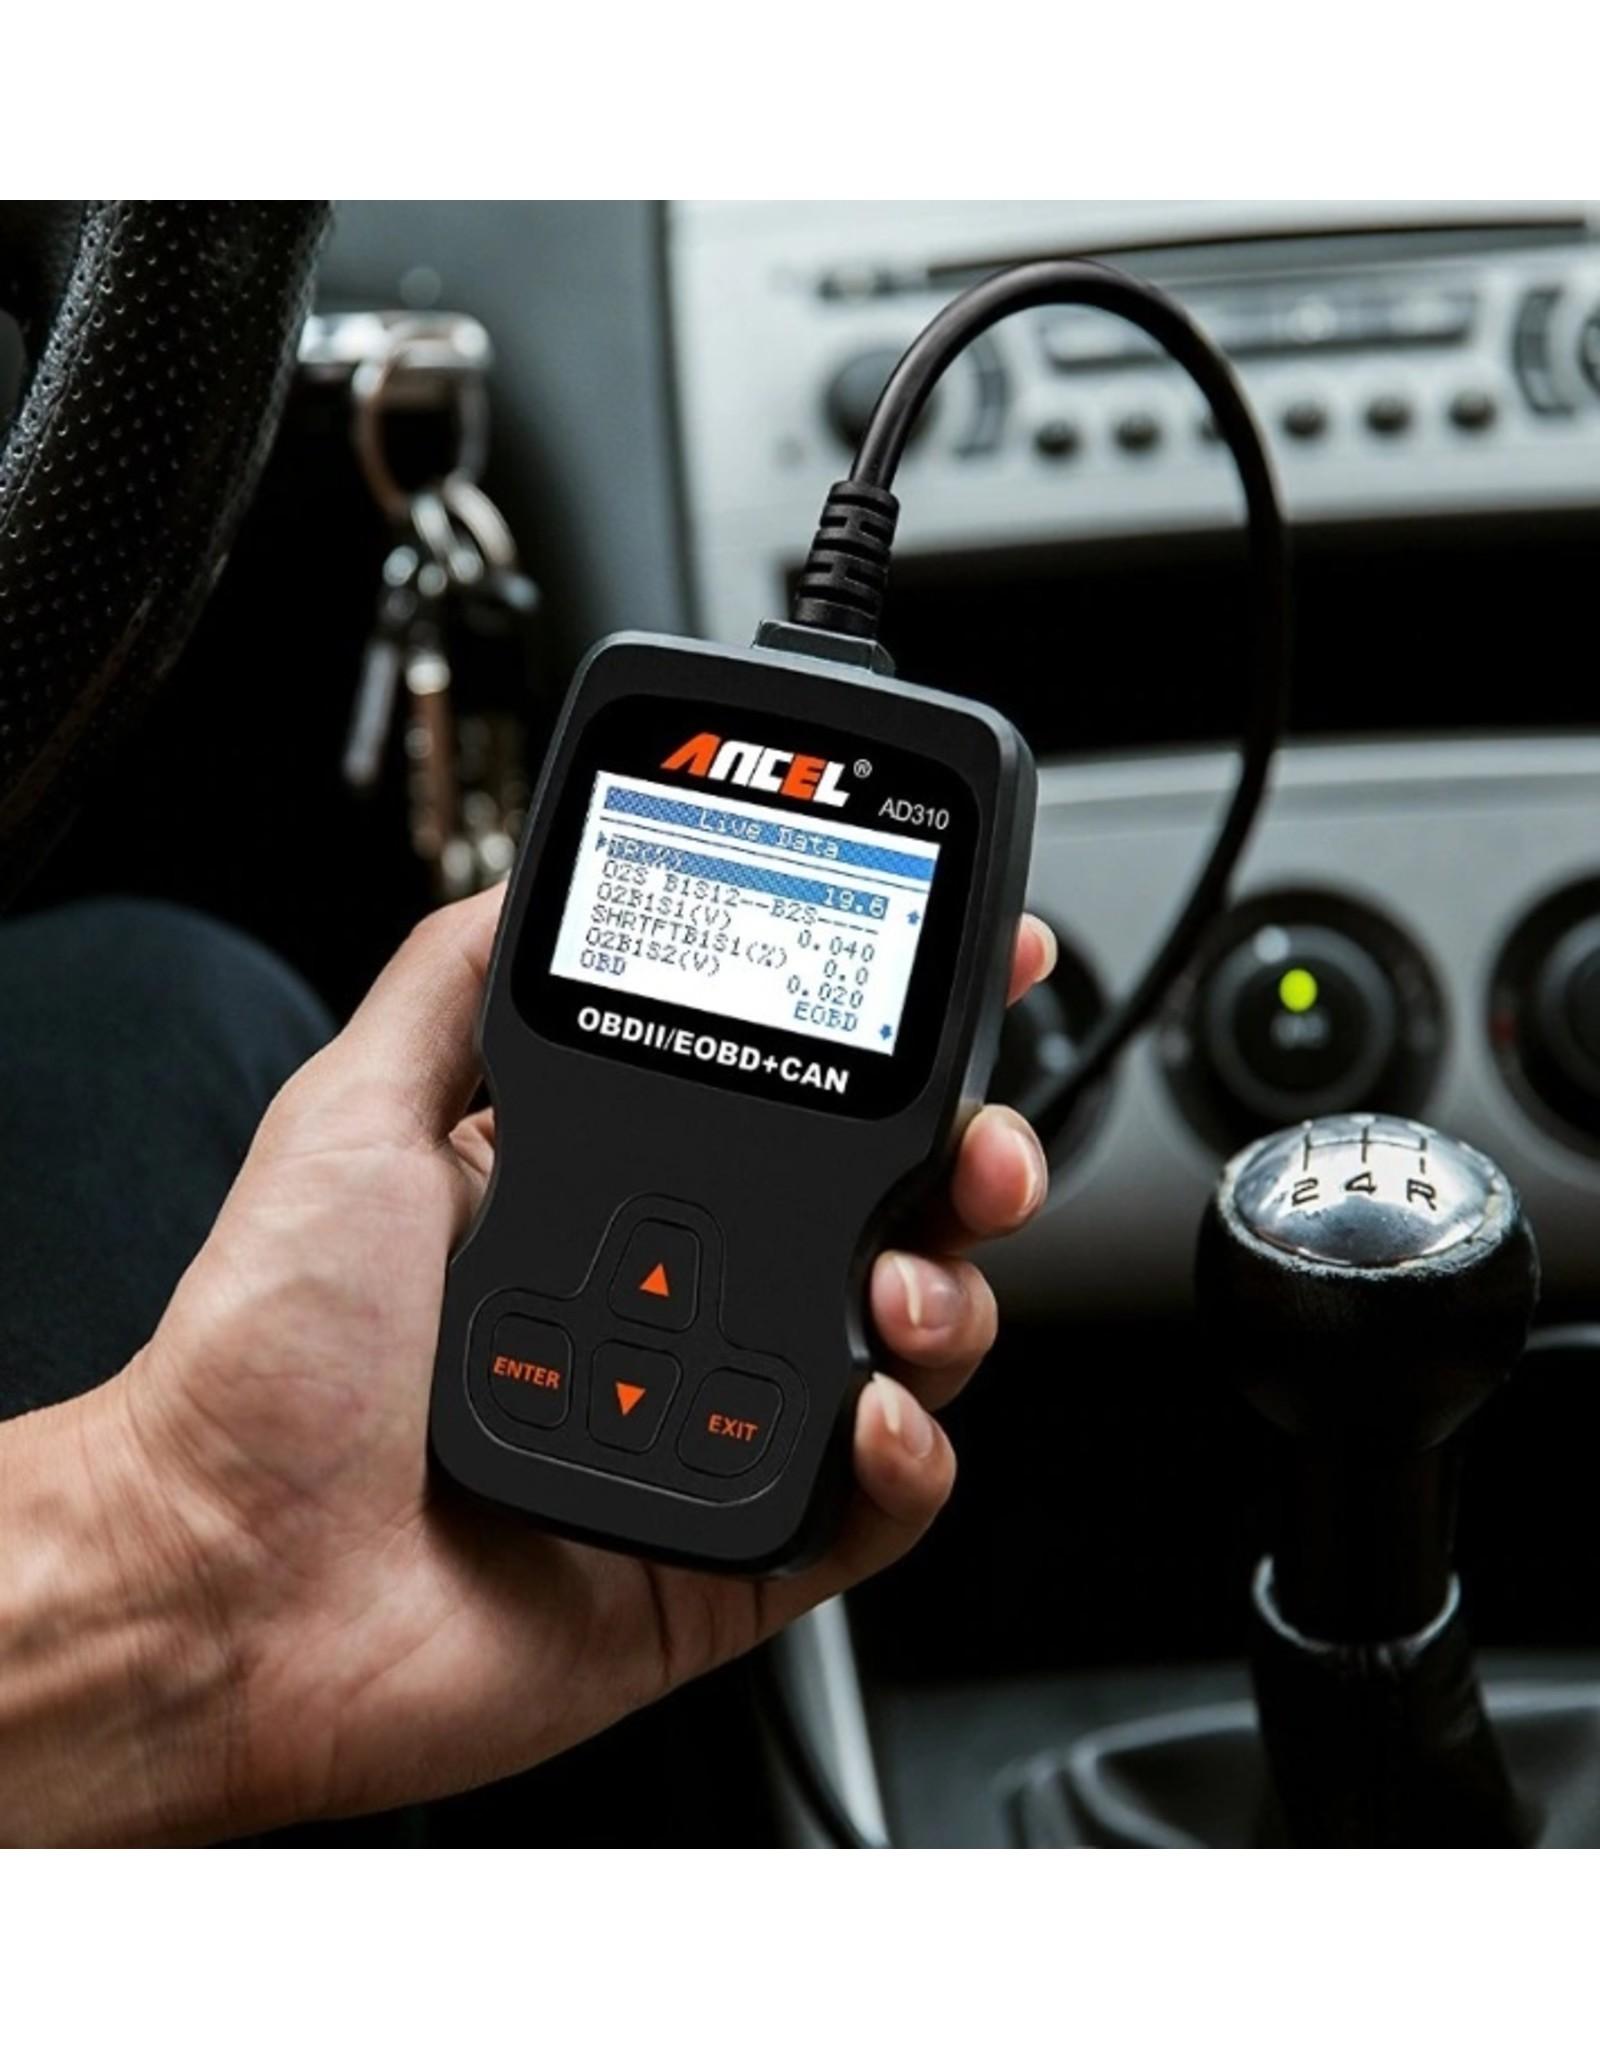 AD310  OBD Scanner - OBD2 - Auto uitlezen - Auto scanner - Diagnose apparatuur voor auto's - Motorstoring